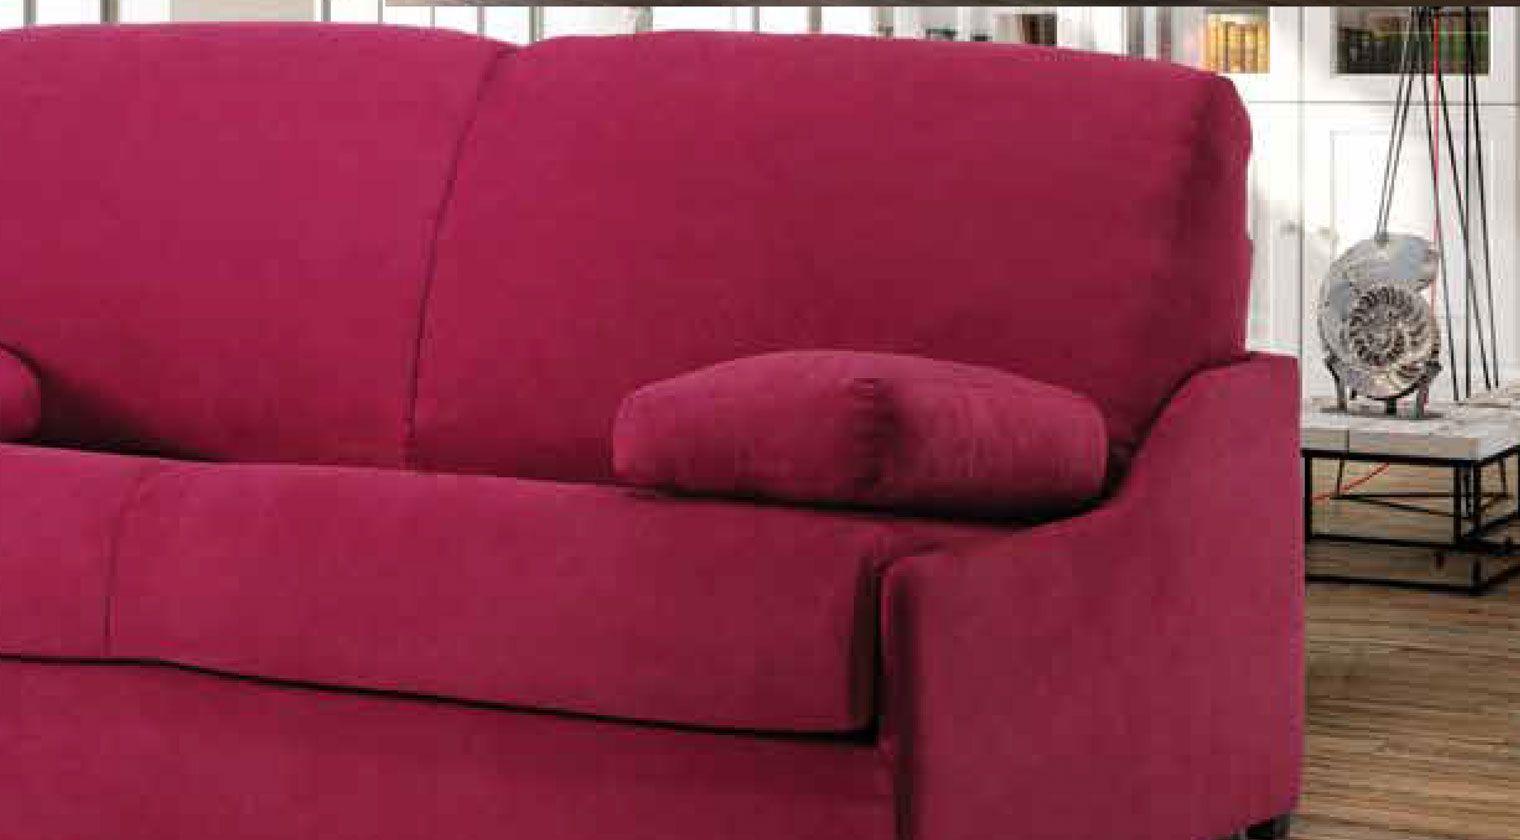 Tiendas de sofas en vigo simple com sofa vigo muebles sofa vigo venta de muebles de segunda - Merkamueble sofas cheslong ...